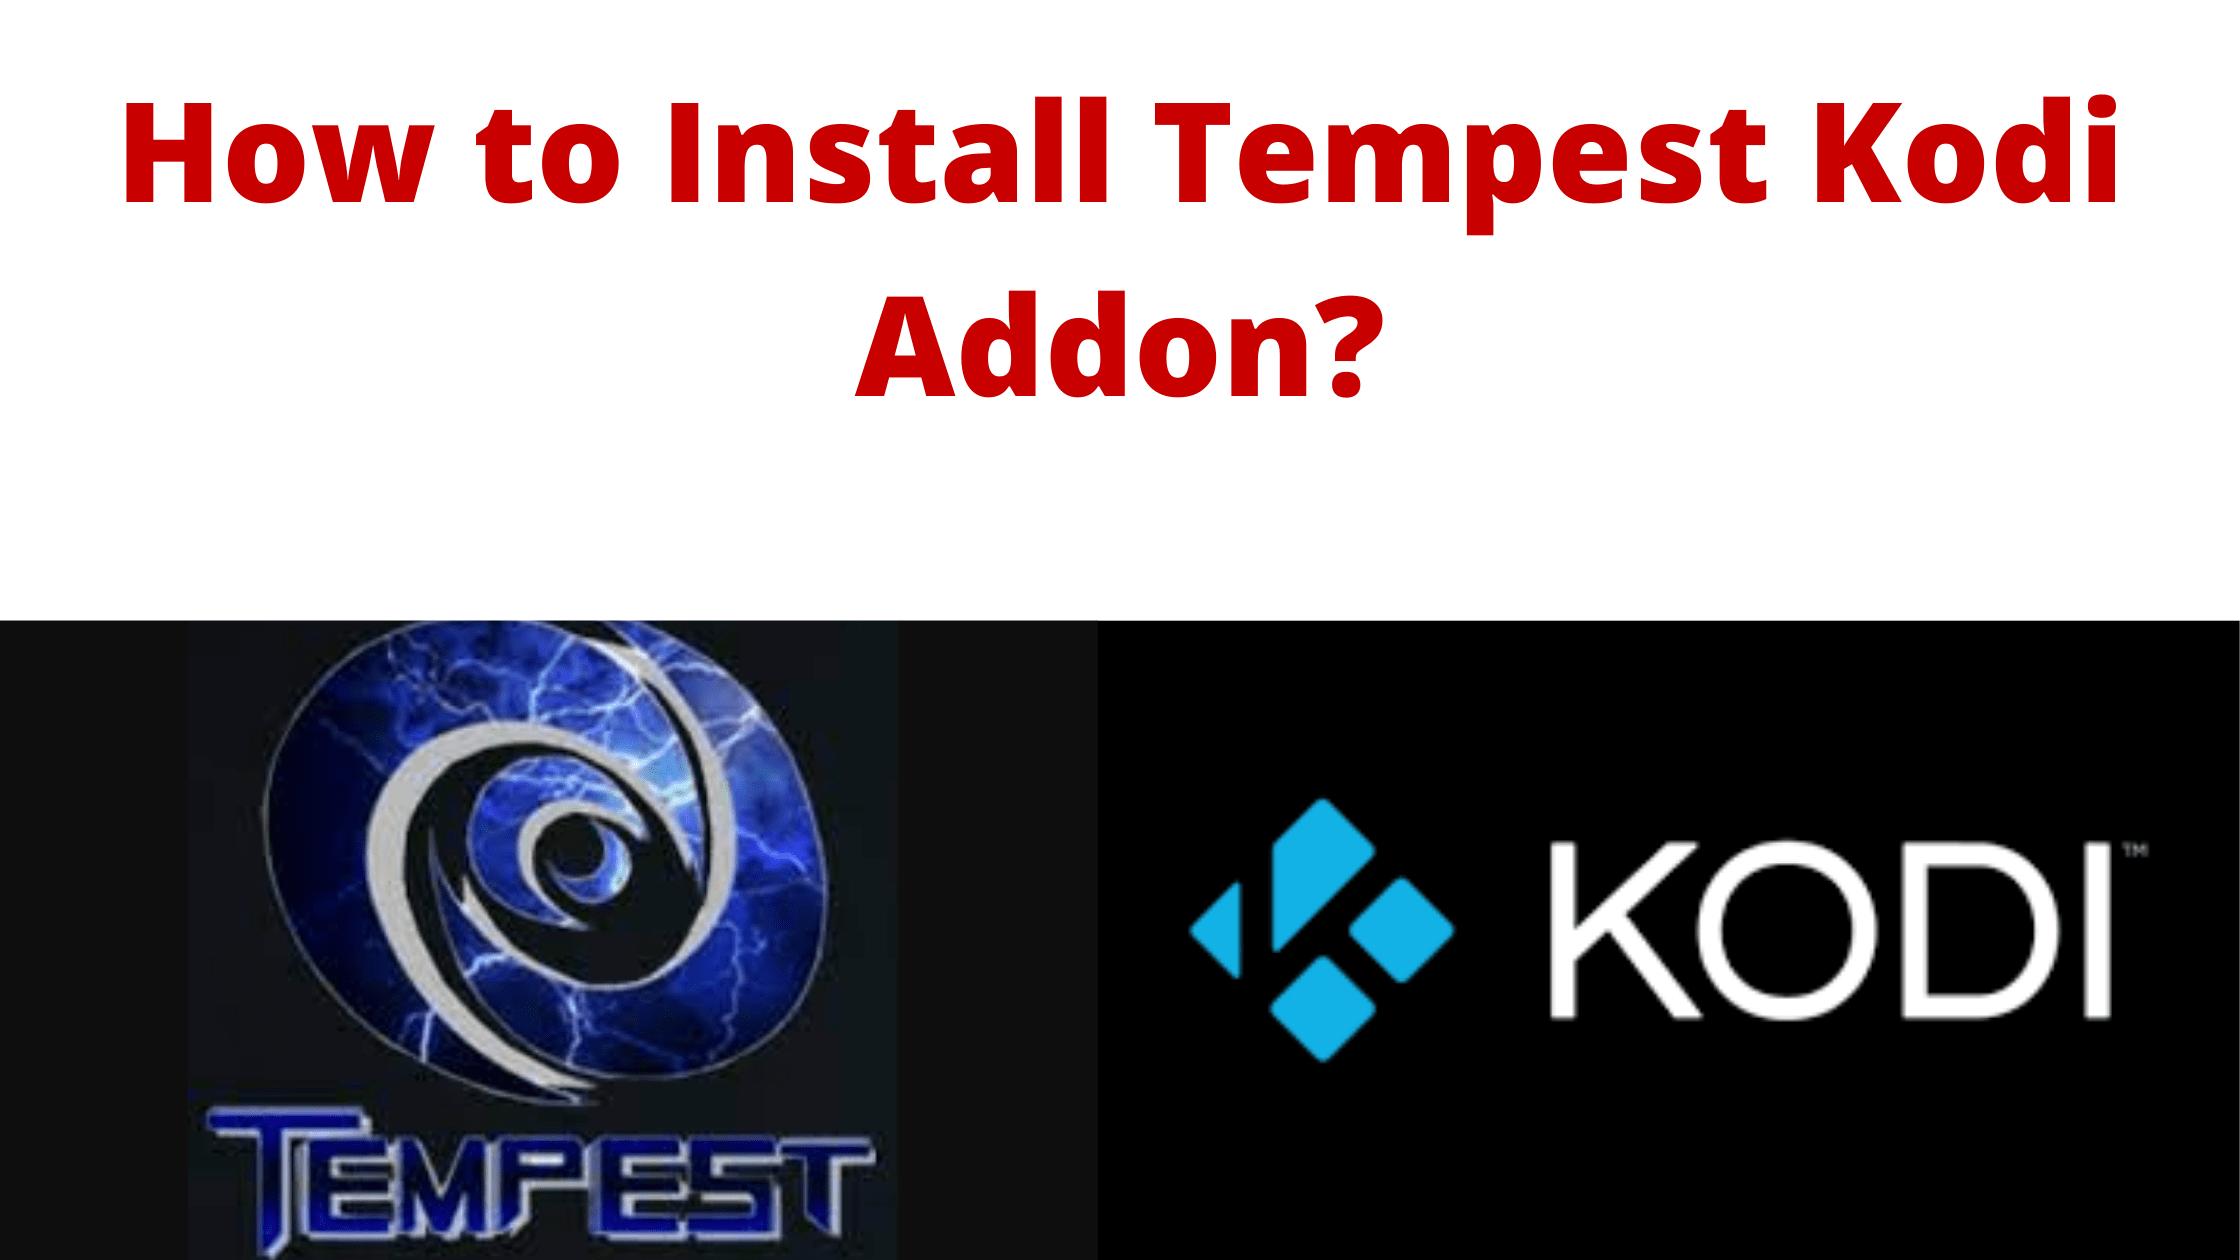 tempest addon